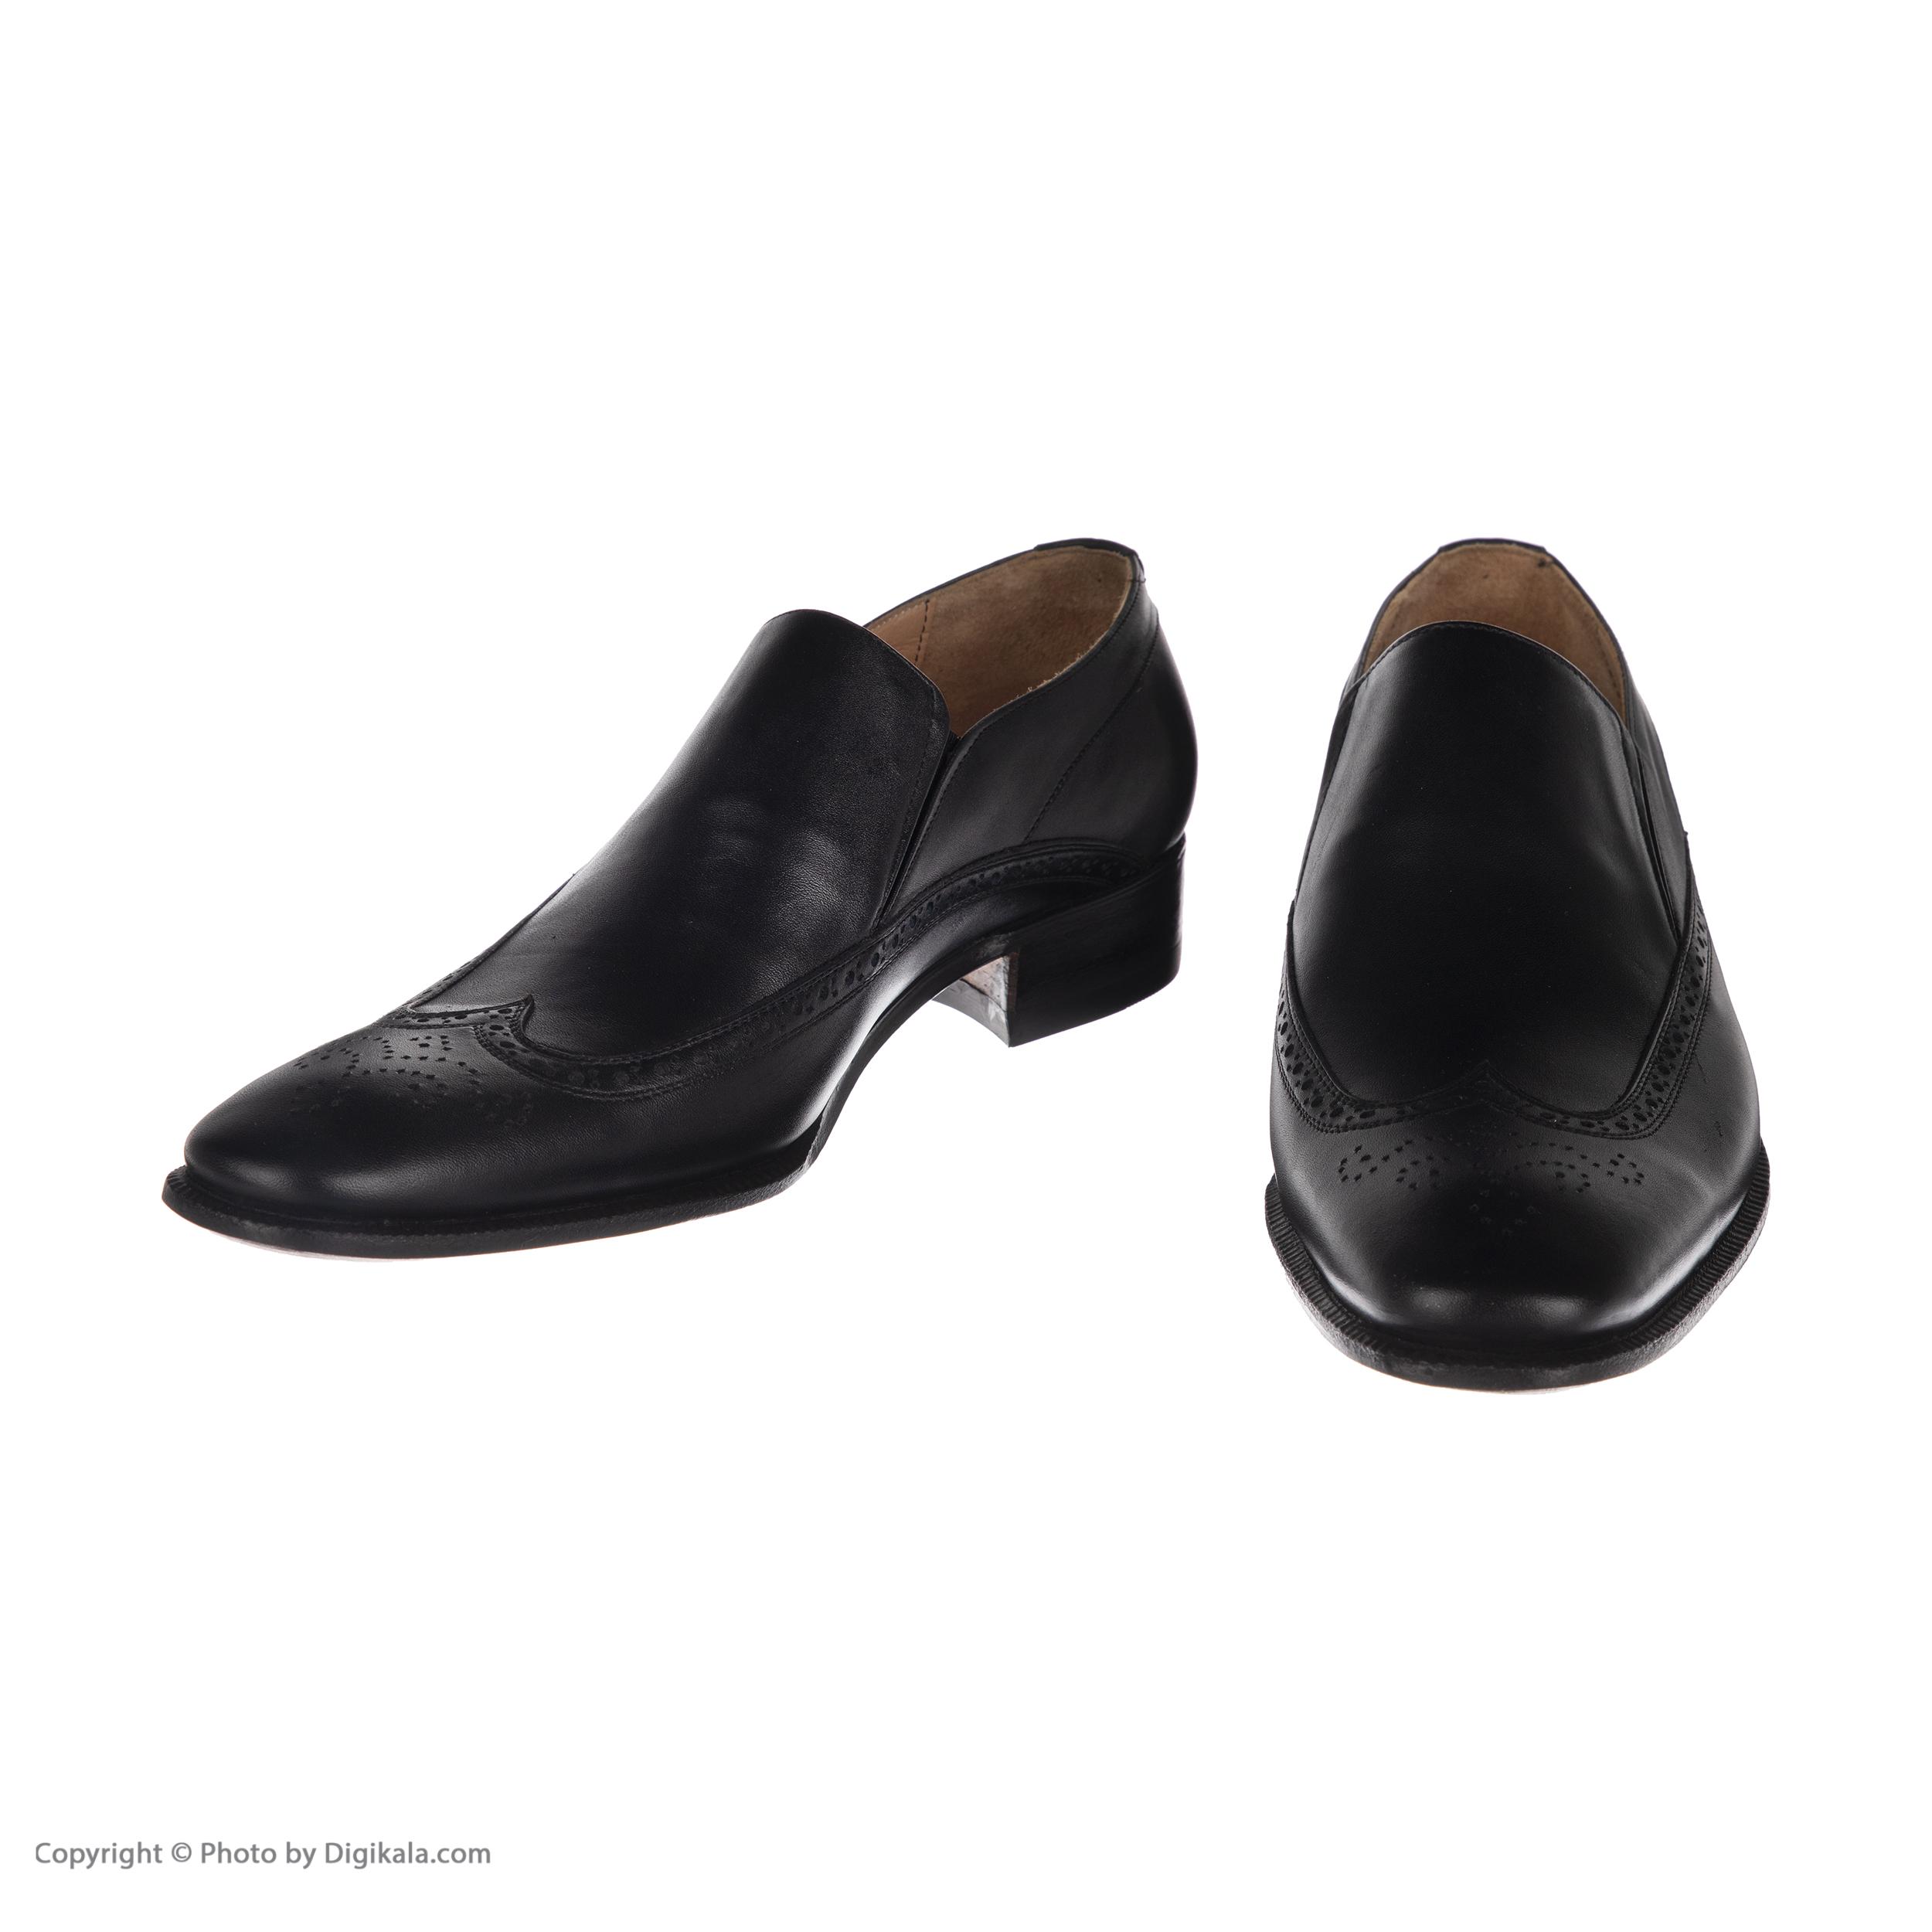 کفش مردانه نظری کد 435 -  - 4